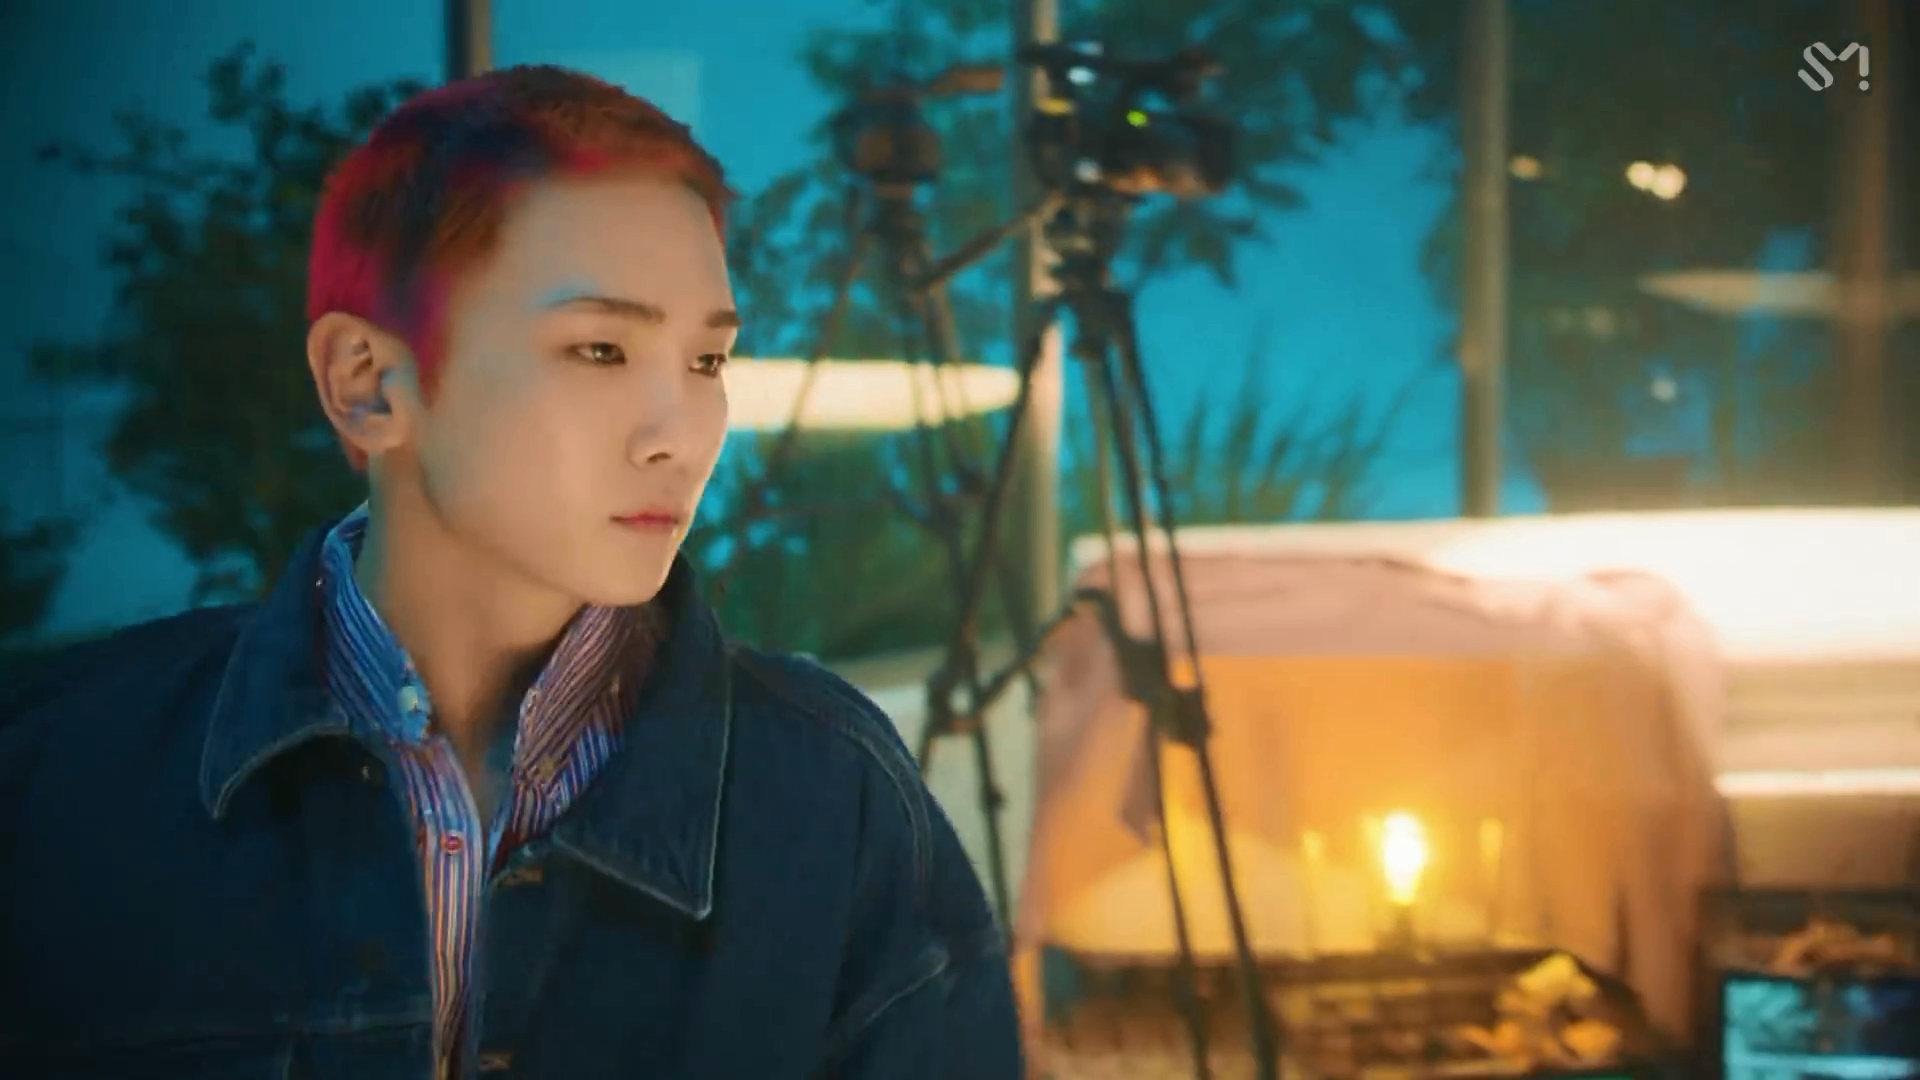 SHINee - Good Evening who's who - K-Pop Database / dbkpop com